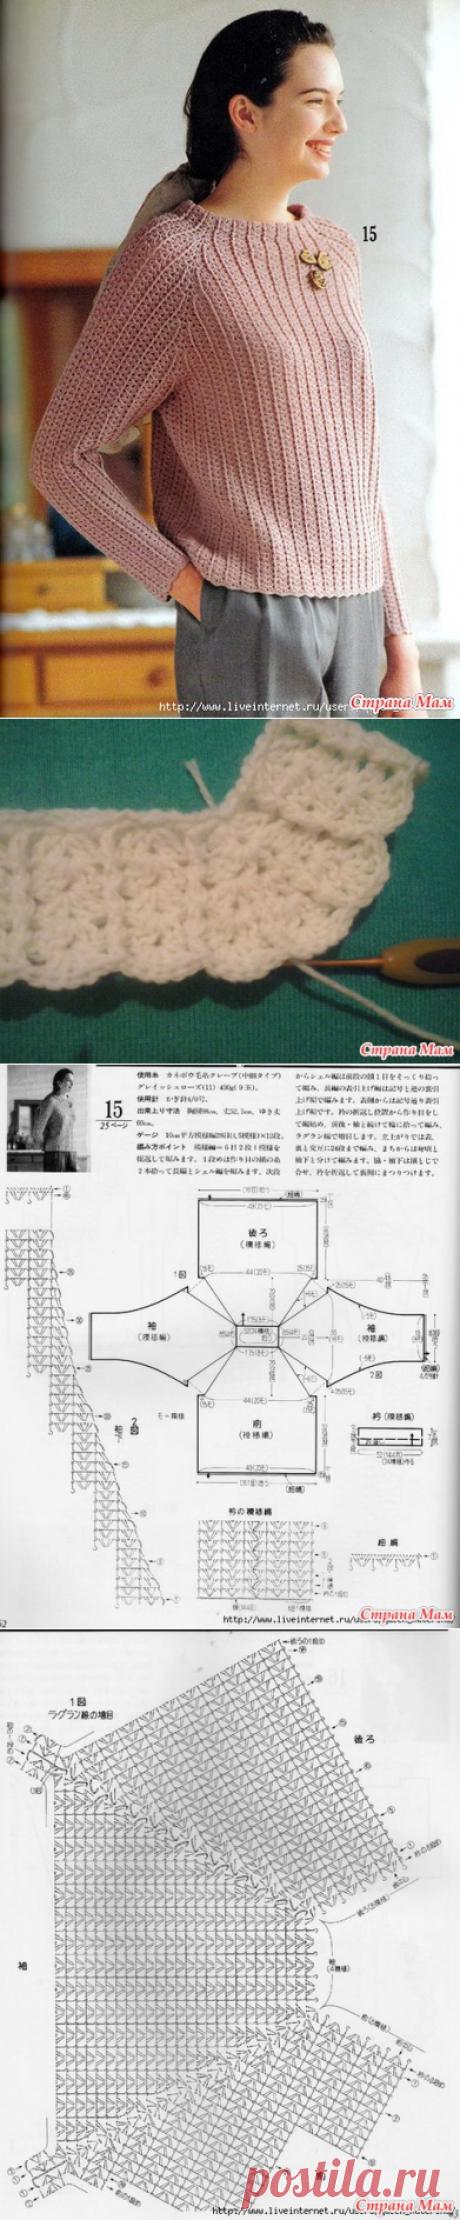 Пуловер реглан крючком - Вяжем вместе он-лайн - Страна Мам